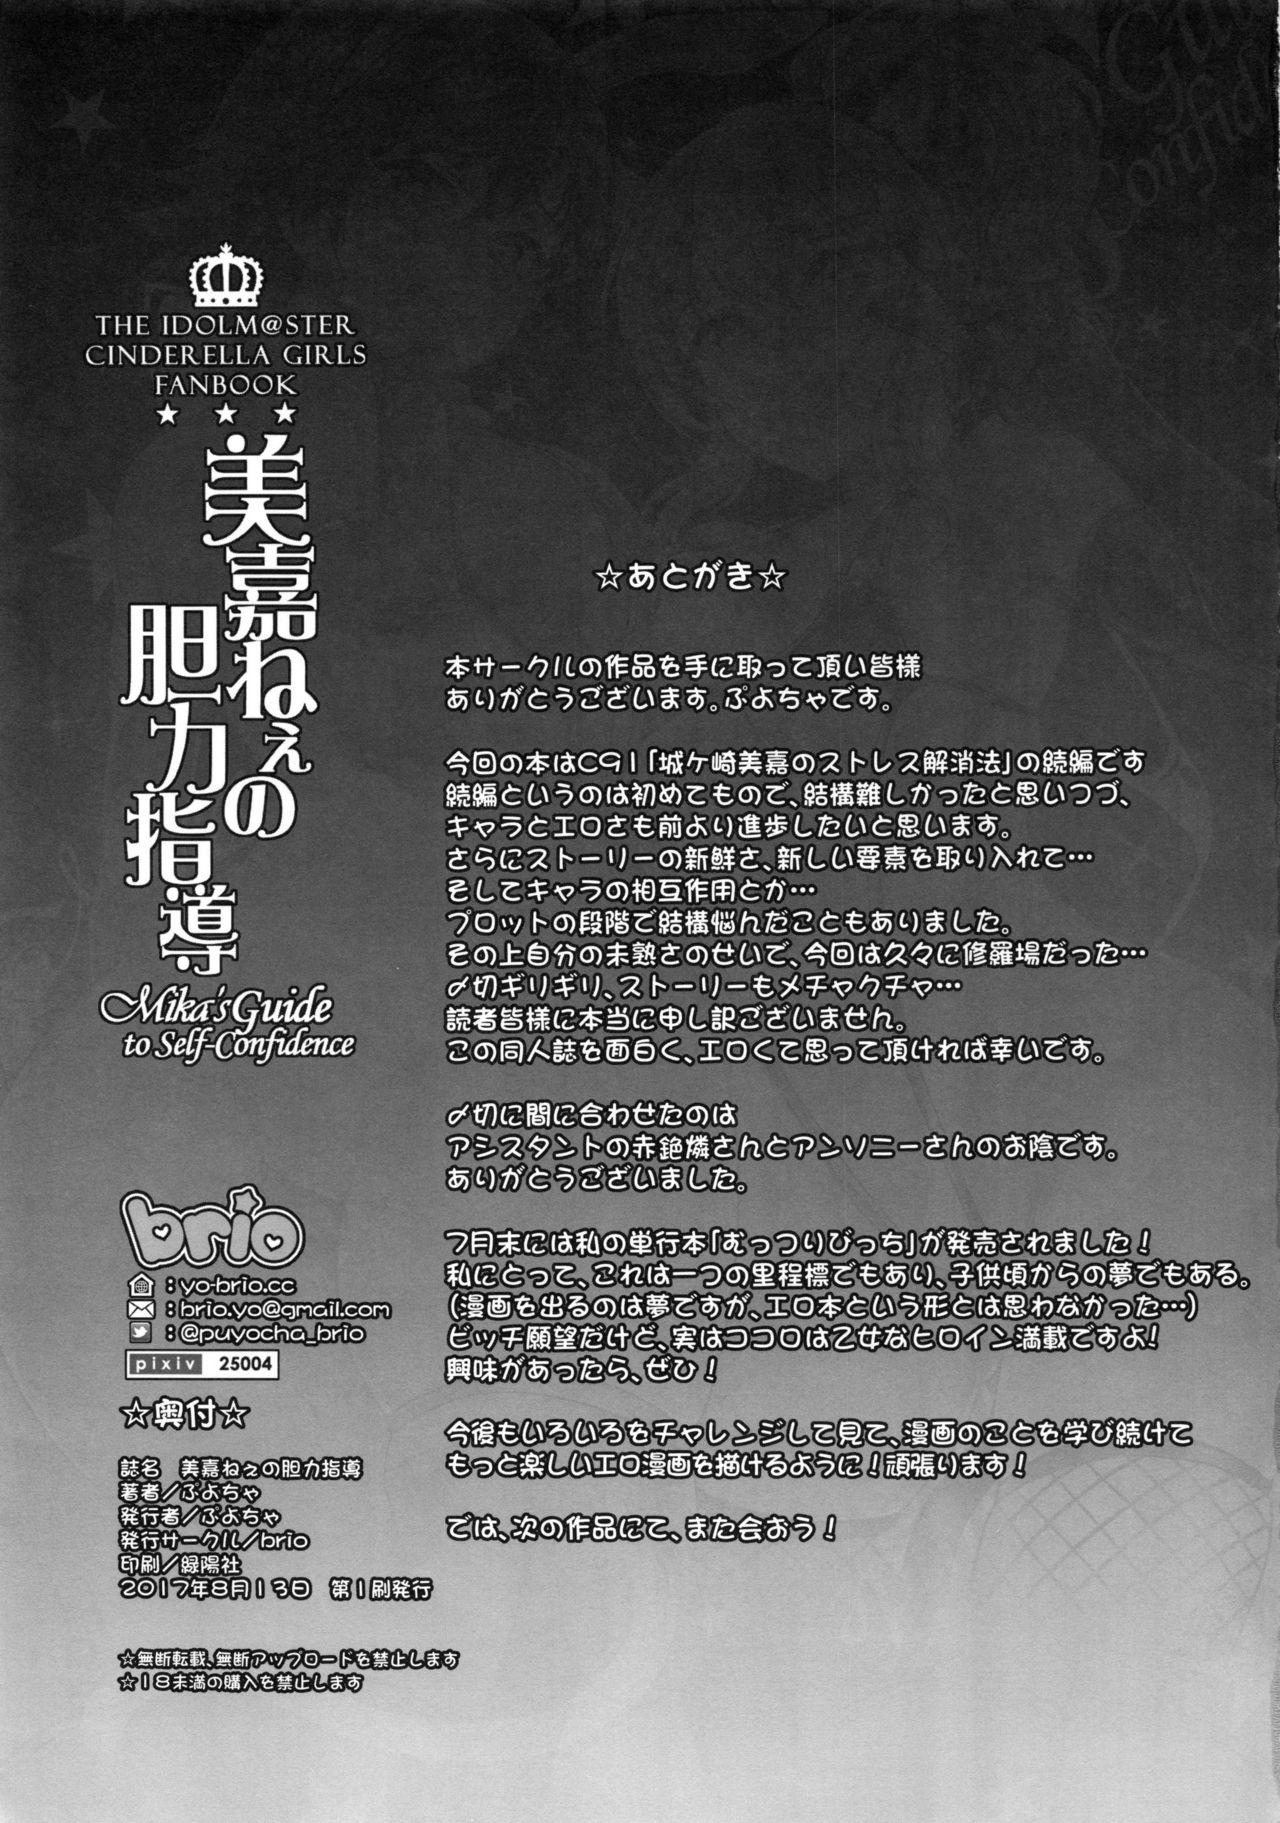 (C92) [BRIO (Puyocha)] Mika-nee no Tanryoku Shidou - Mika's Guide to Self-Confidence (THE IDOLM@STER CINDERELLA GIRLS) 23